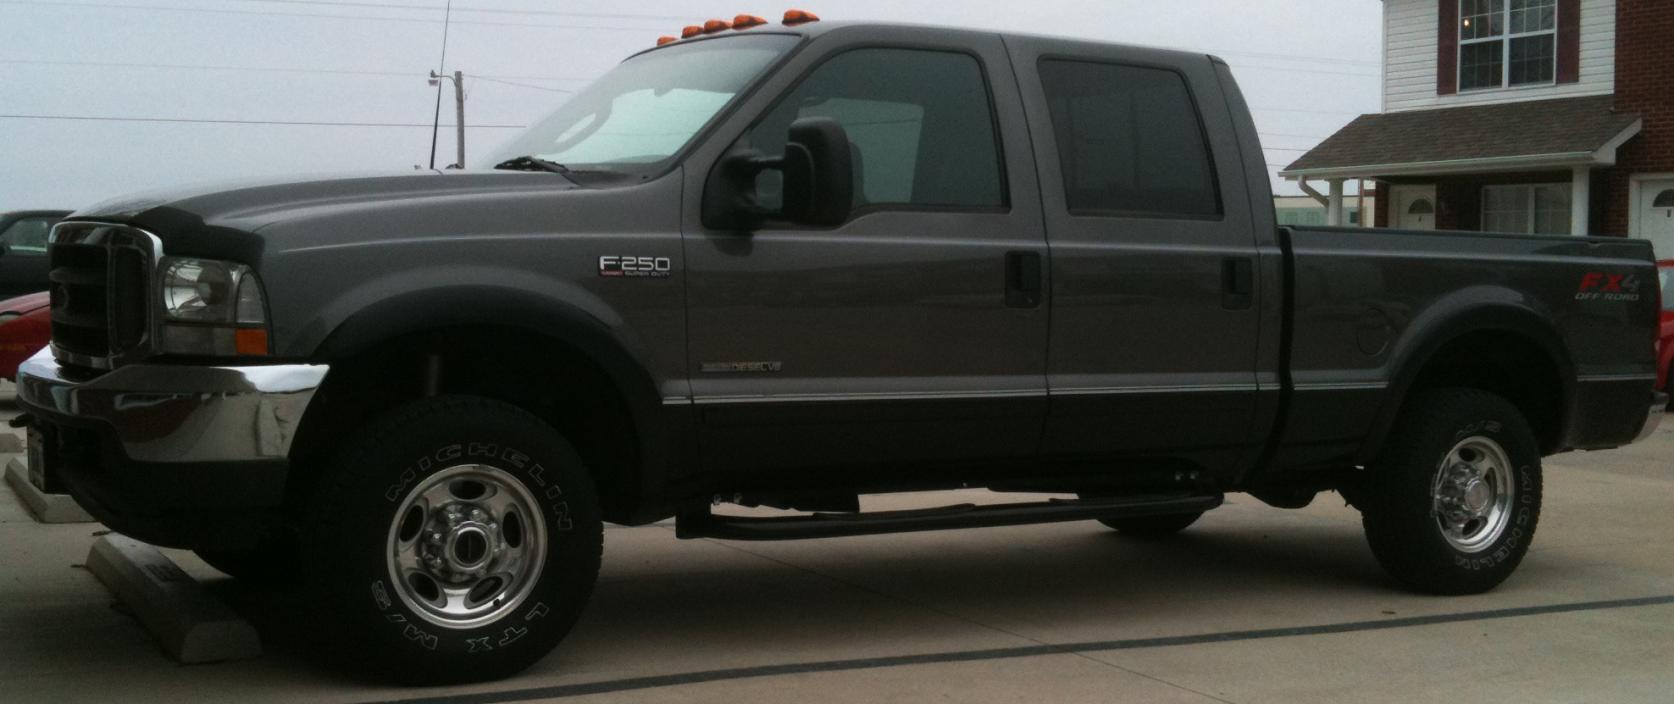 I Love Craigslist!-truck1.jpg